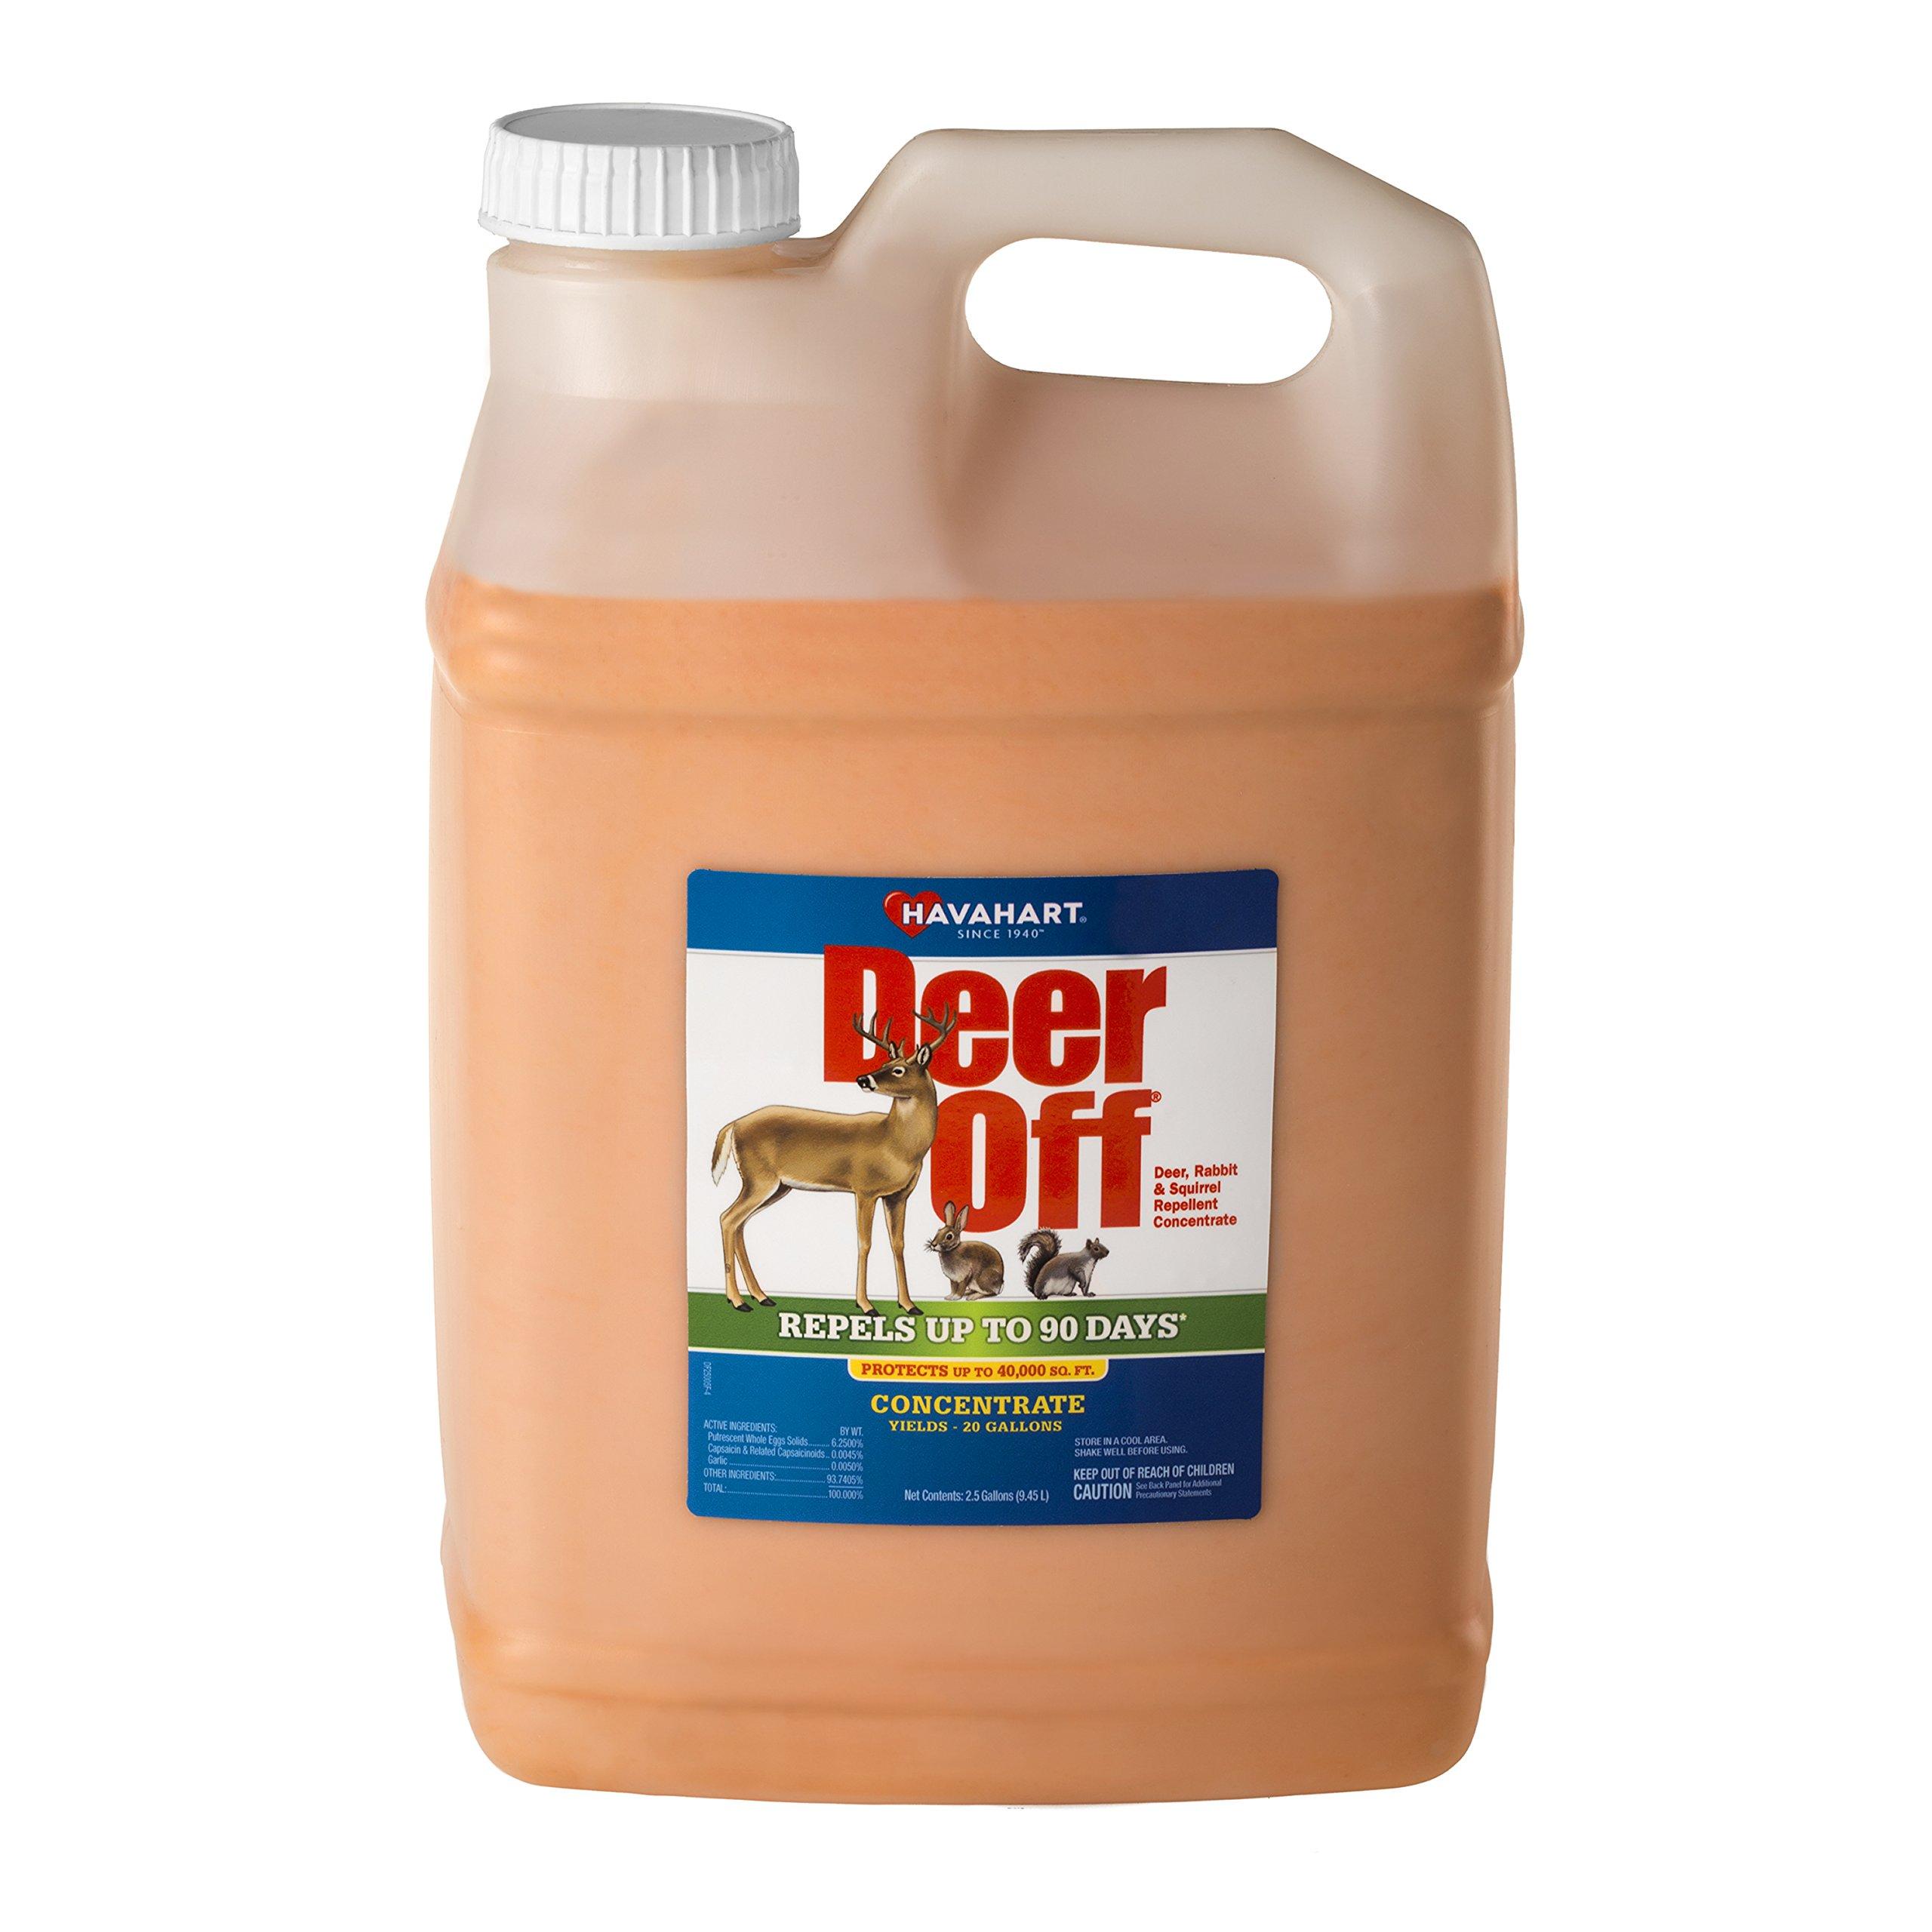 Deer Off Deer, Rabbit and Squirrel Repellent Concentrate, 2.5 gallon